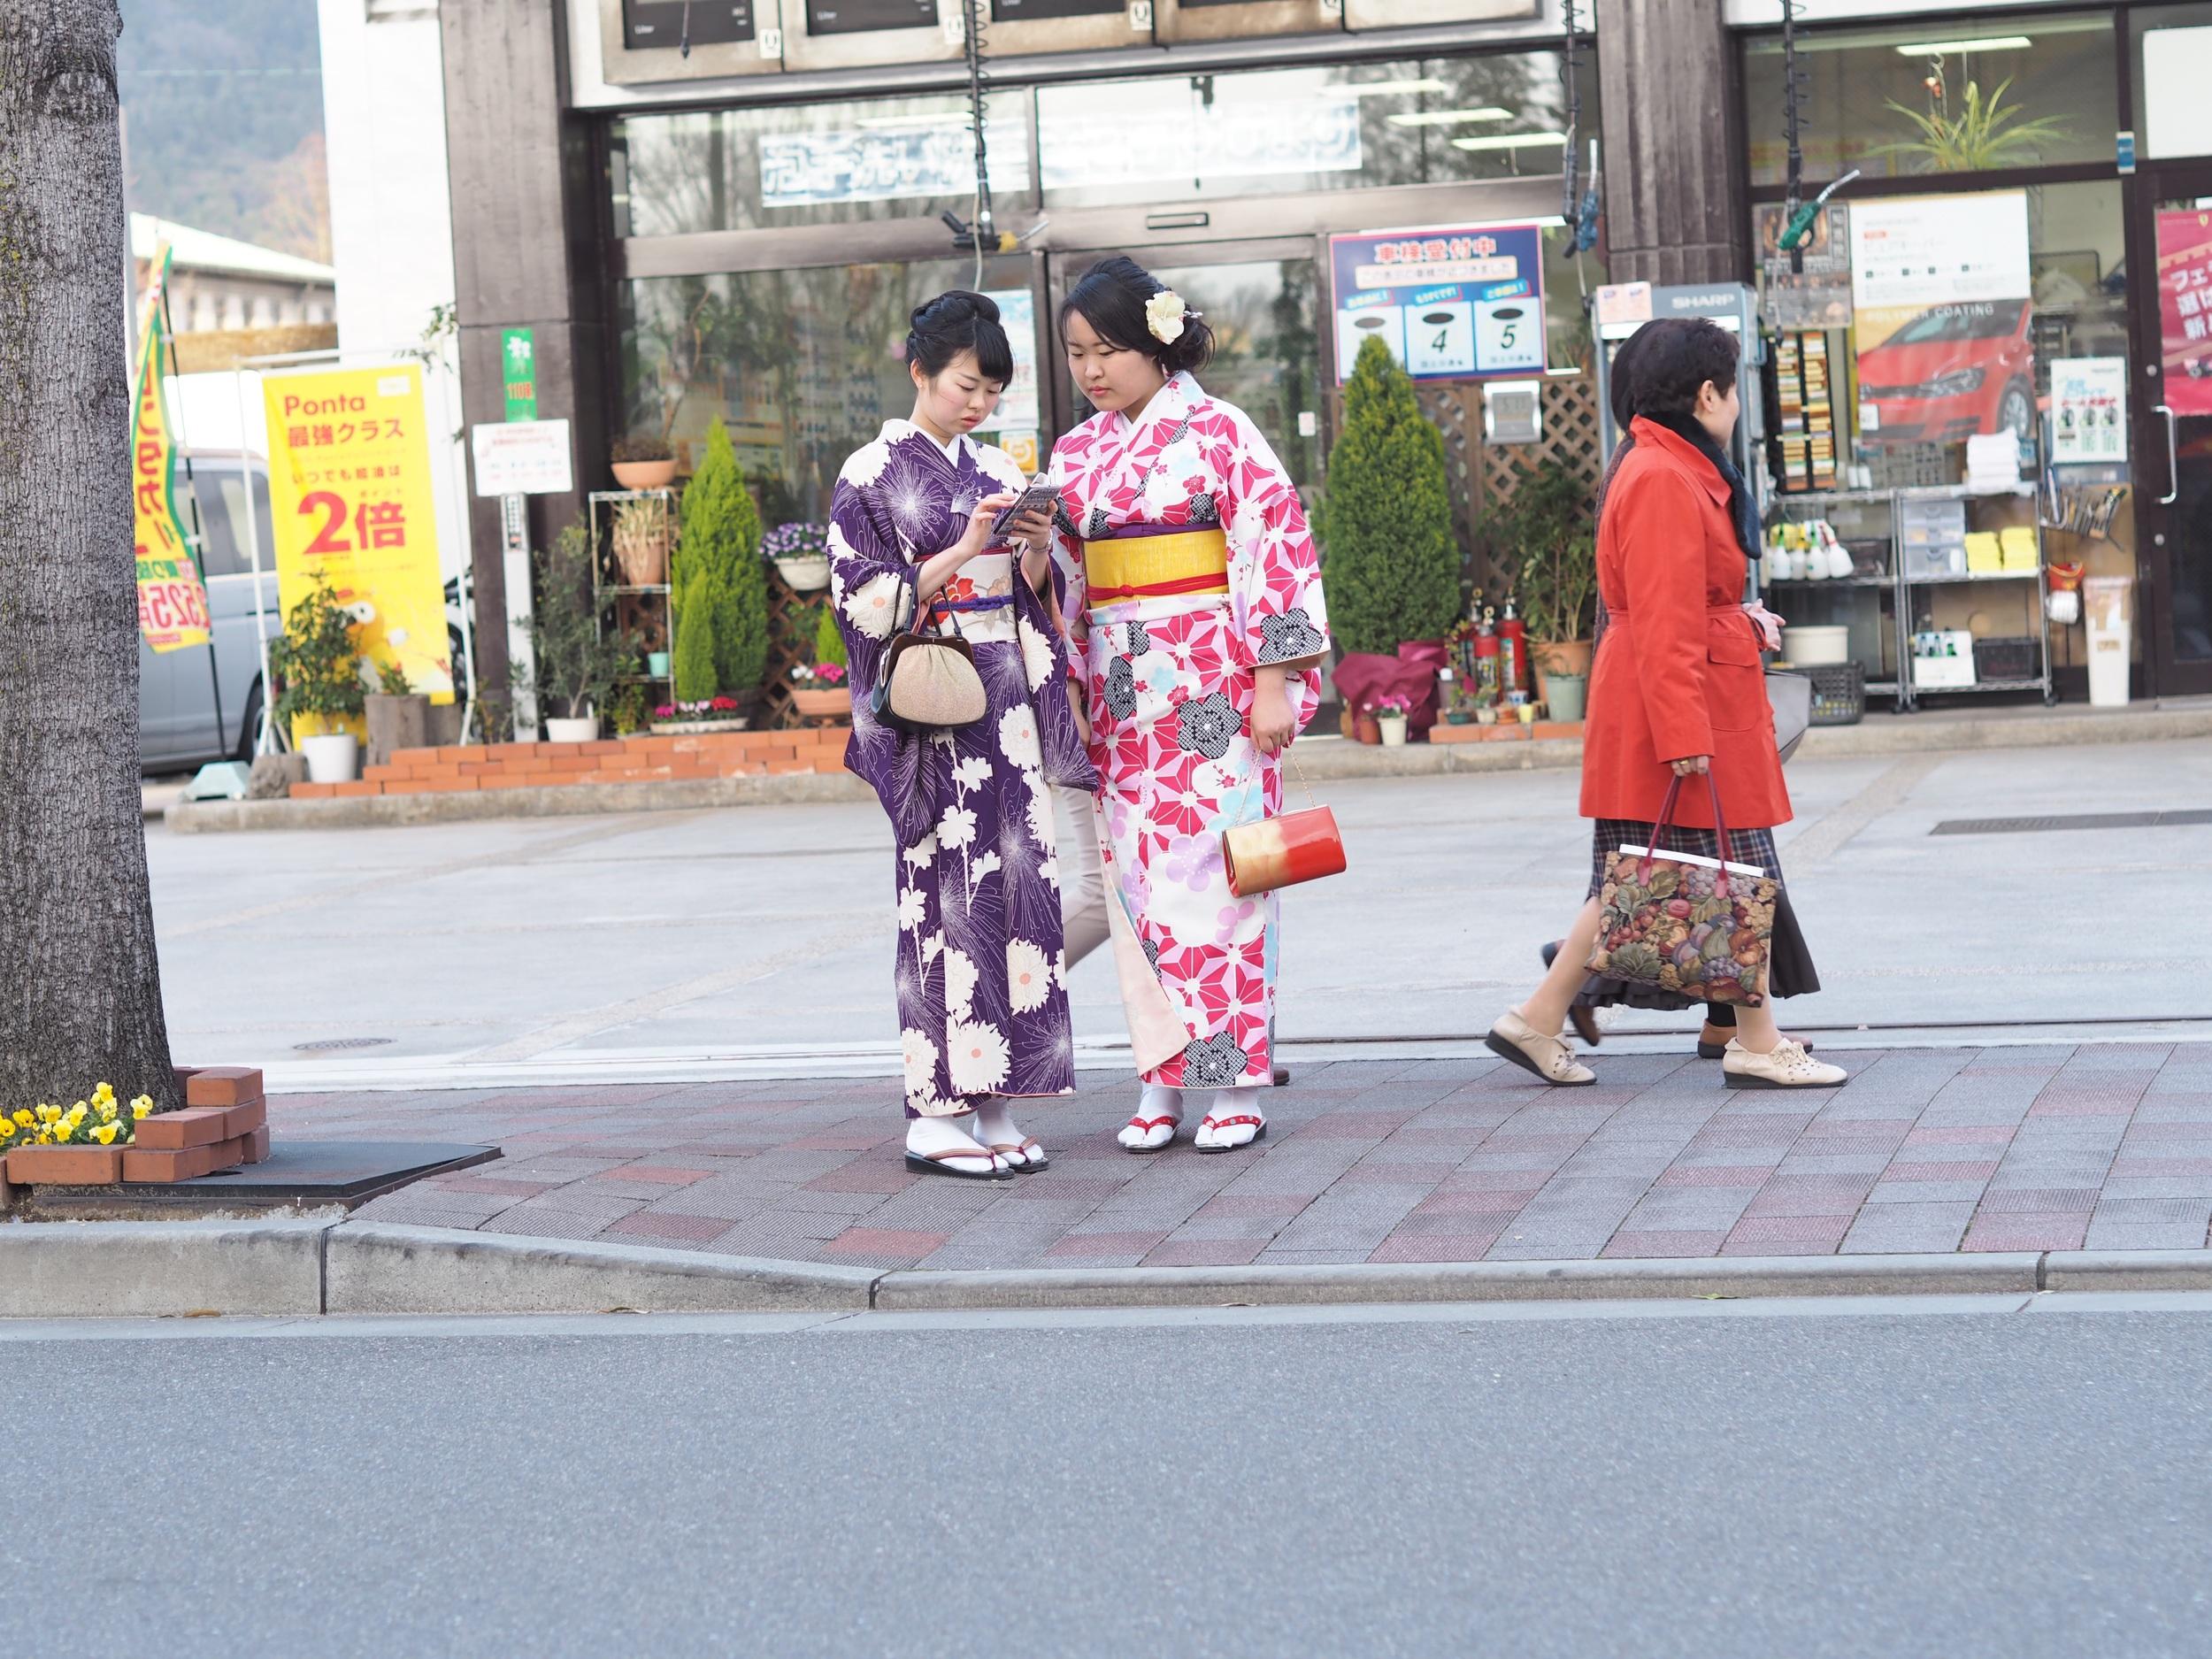 The iPhone matches the kimono